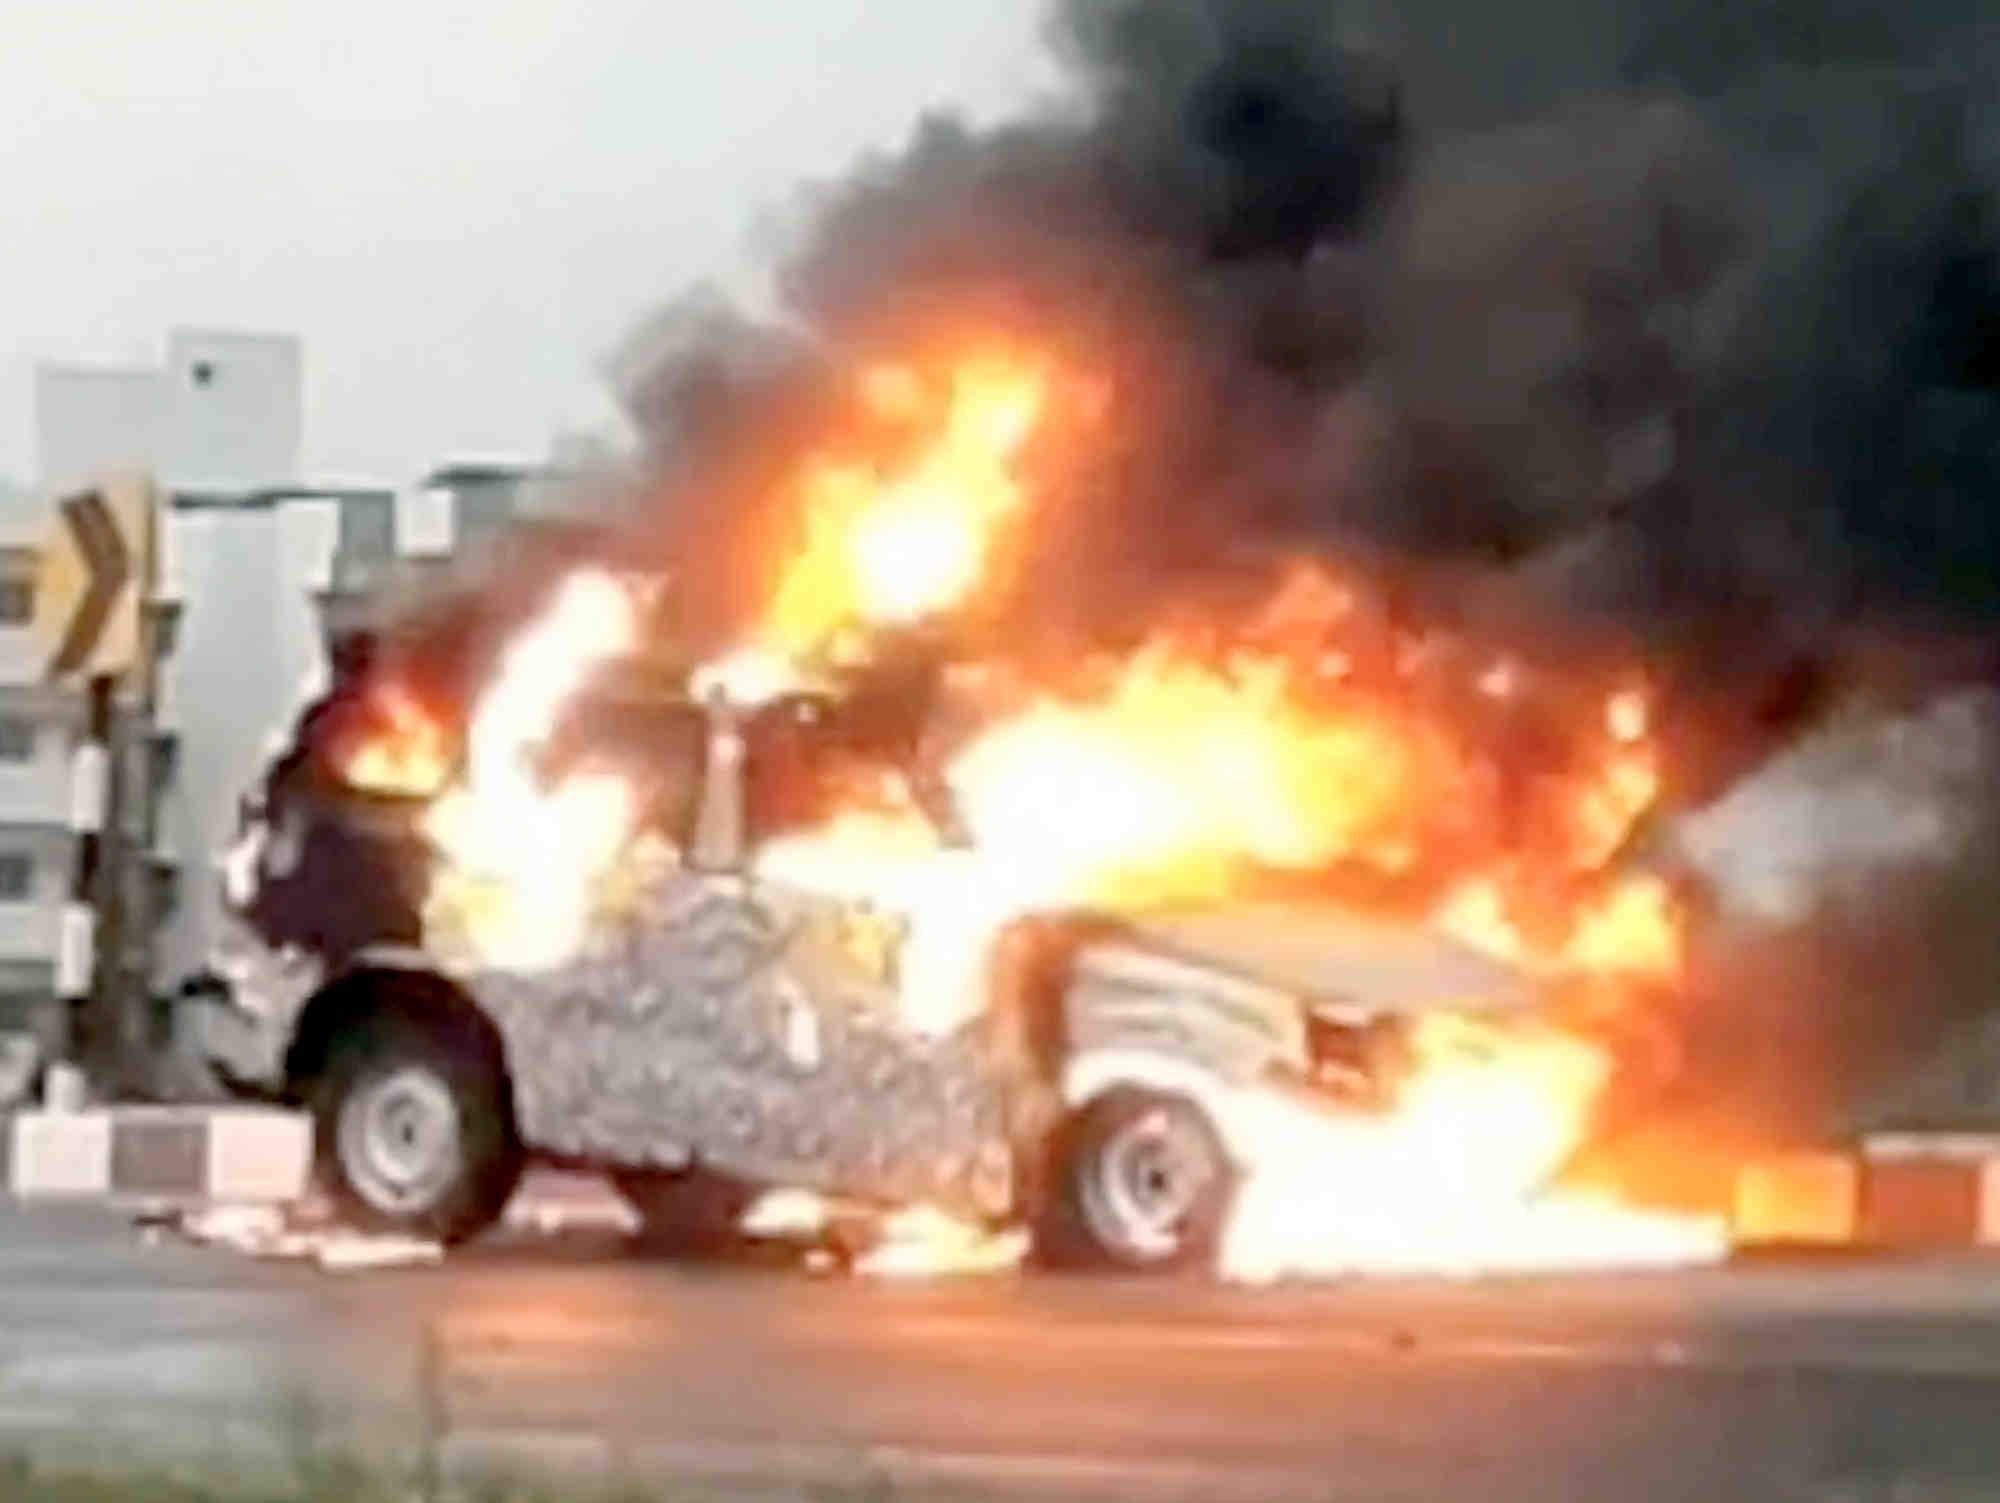 2020 Mahindra Scorpio fire video